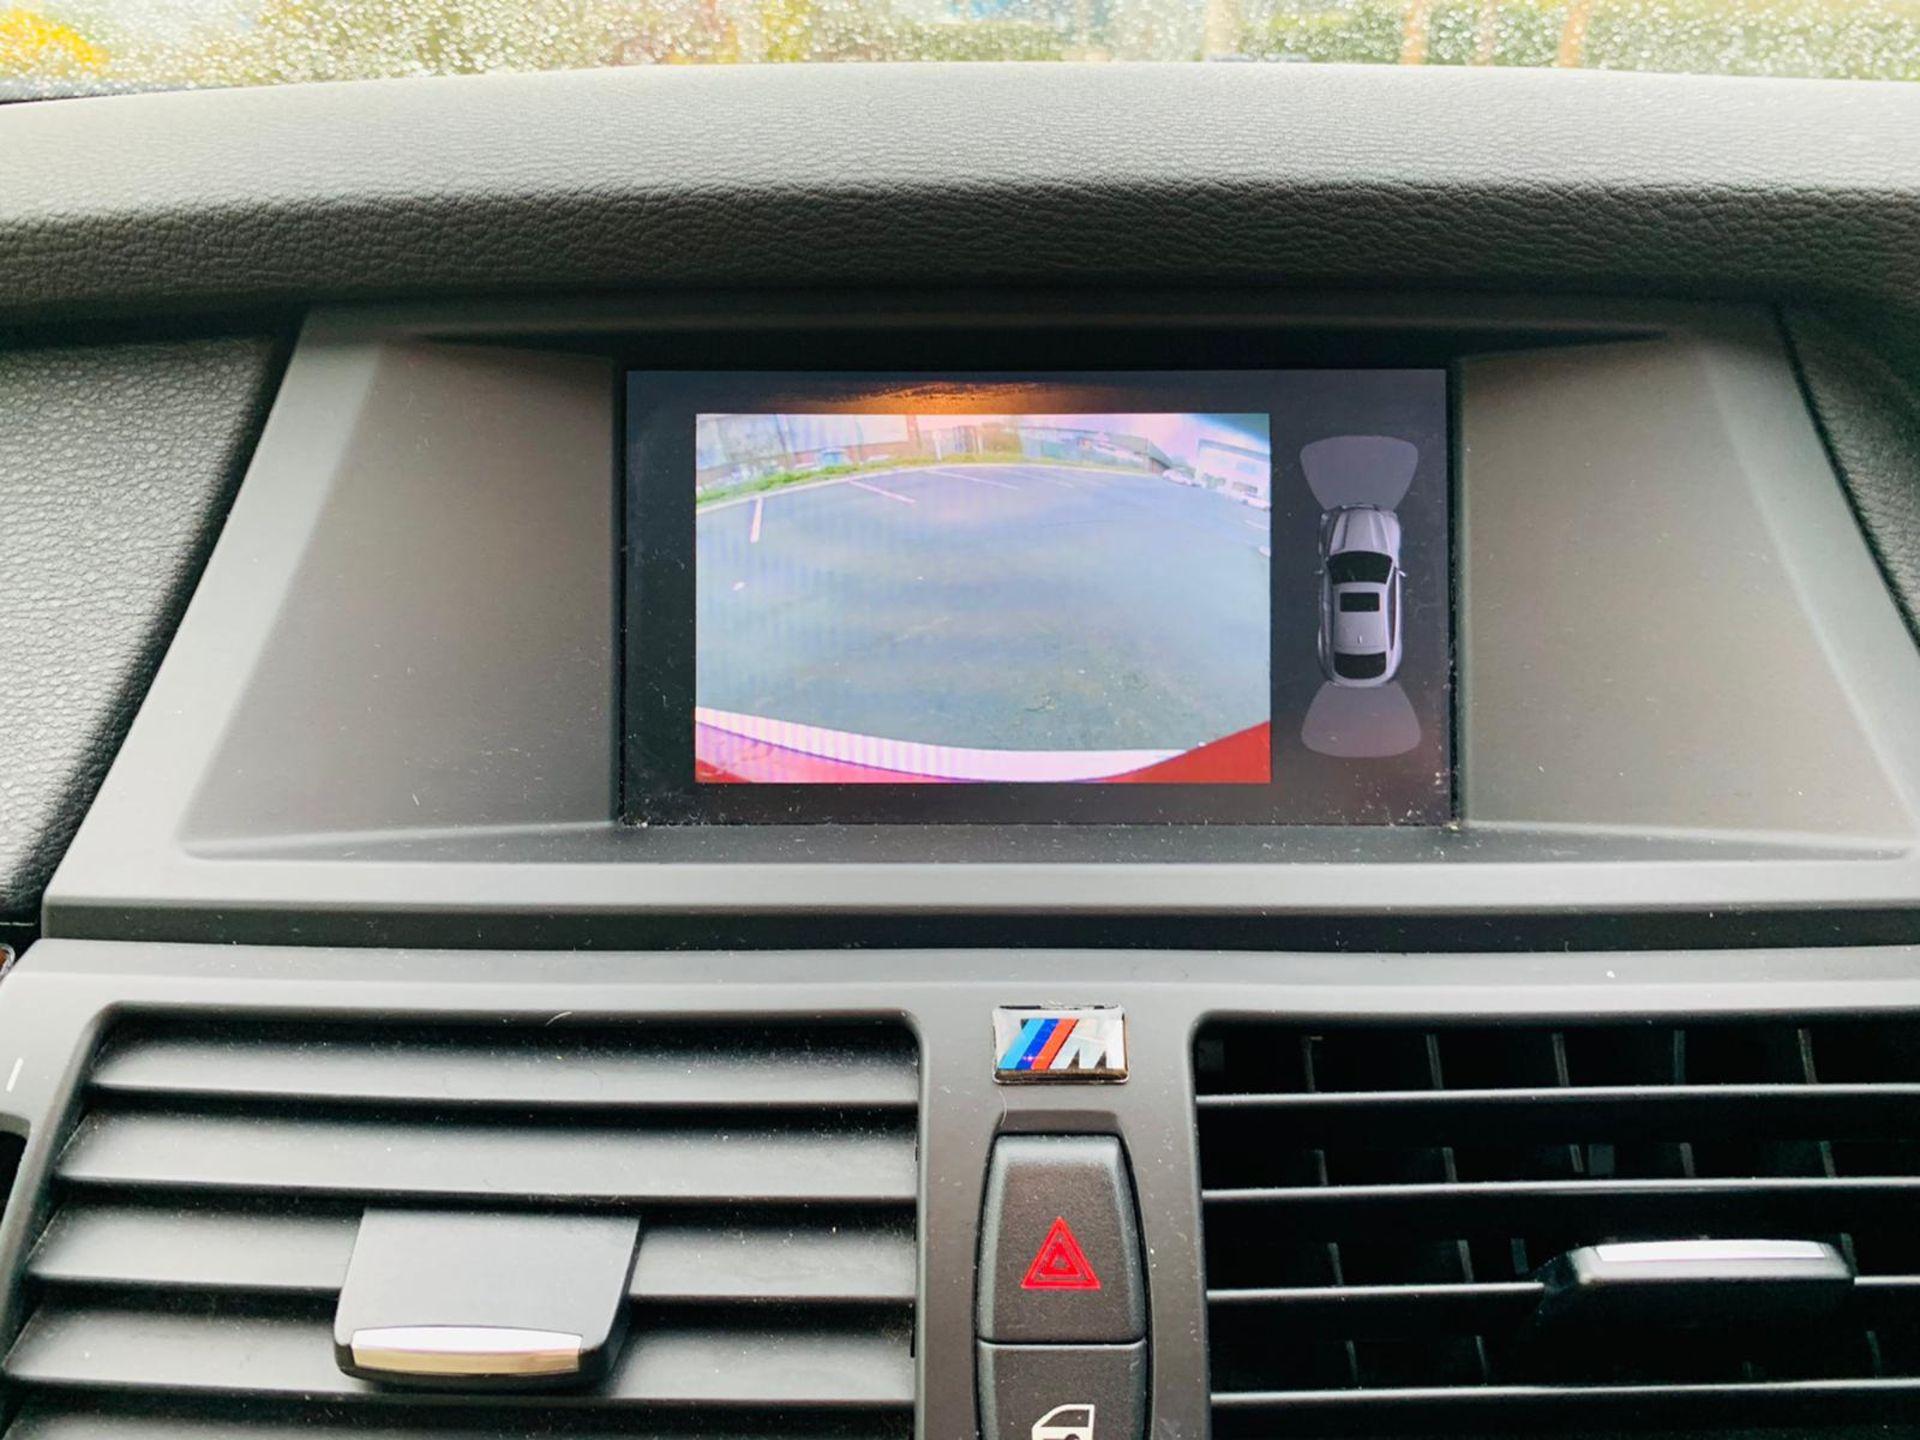 Reseve Met - BMW X6 xDrive 3.0d Auto - 2014 Reg - Leather Interior -Parking Sensors - Reversing Cam - Image 22 of 30